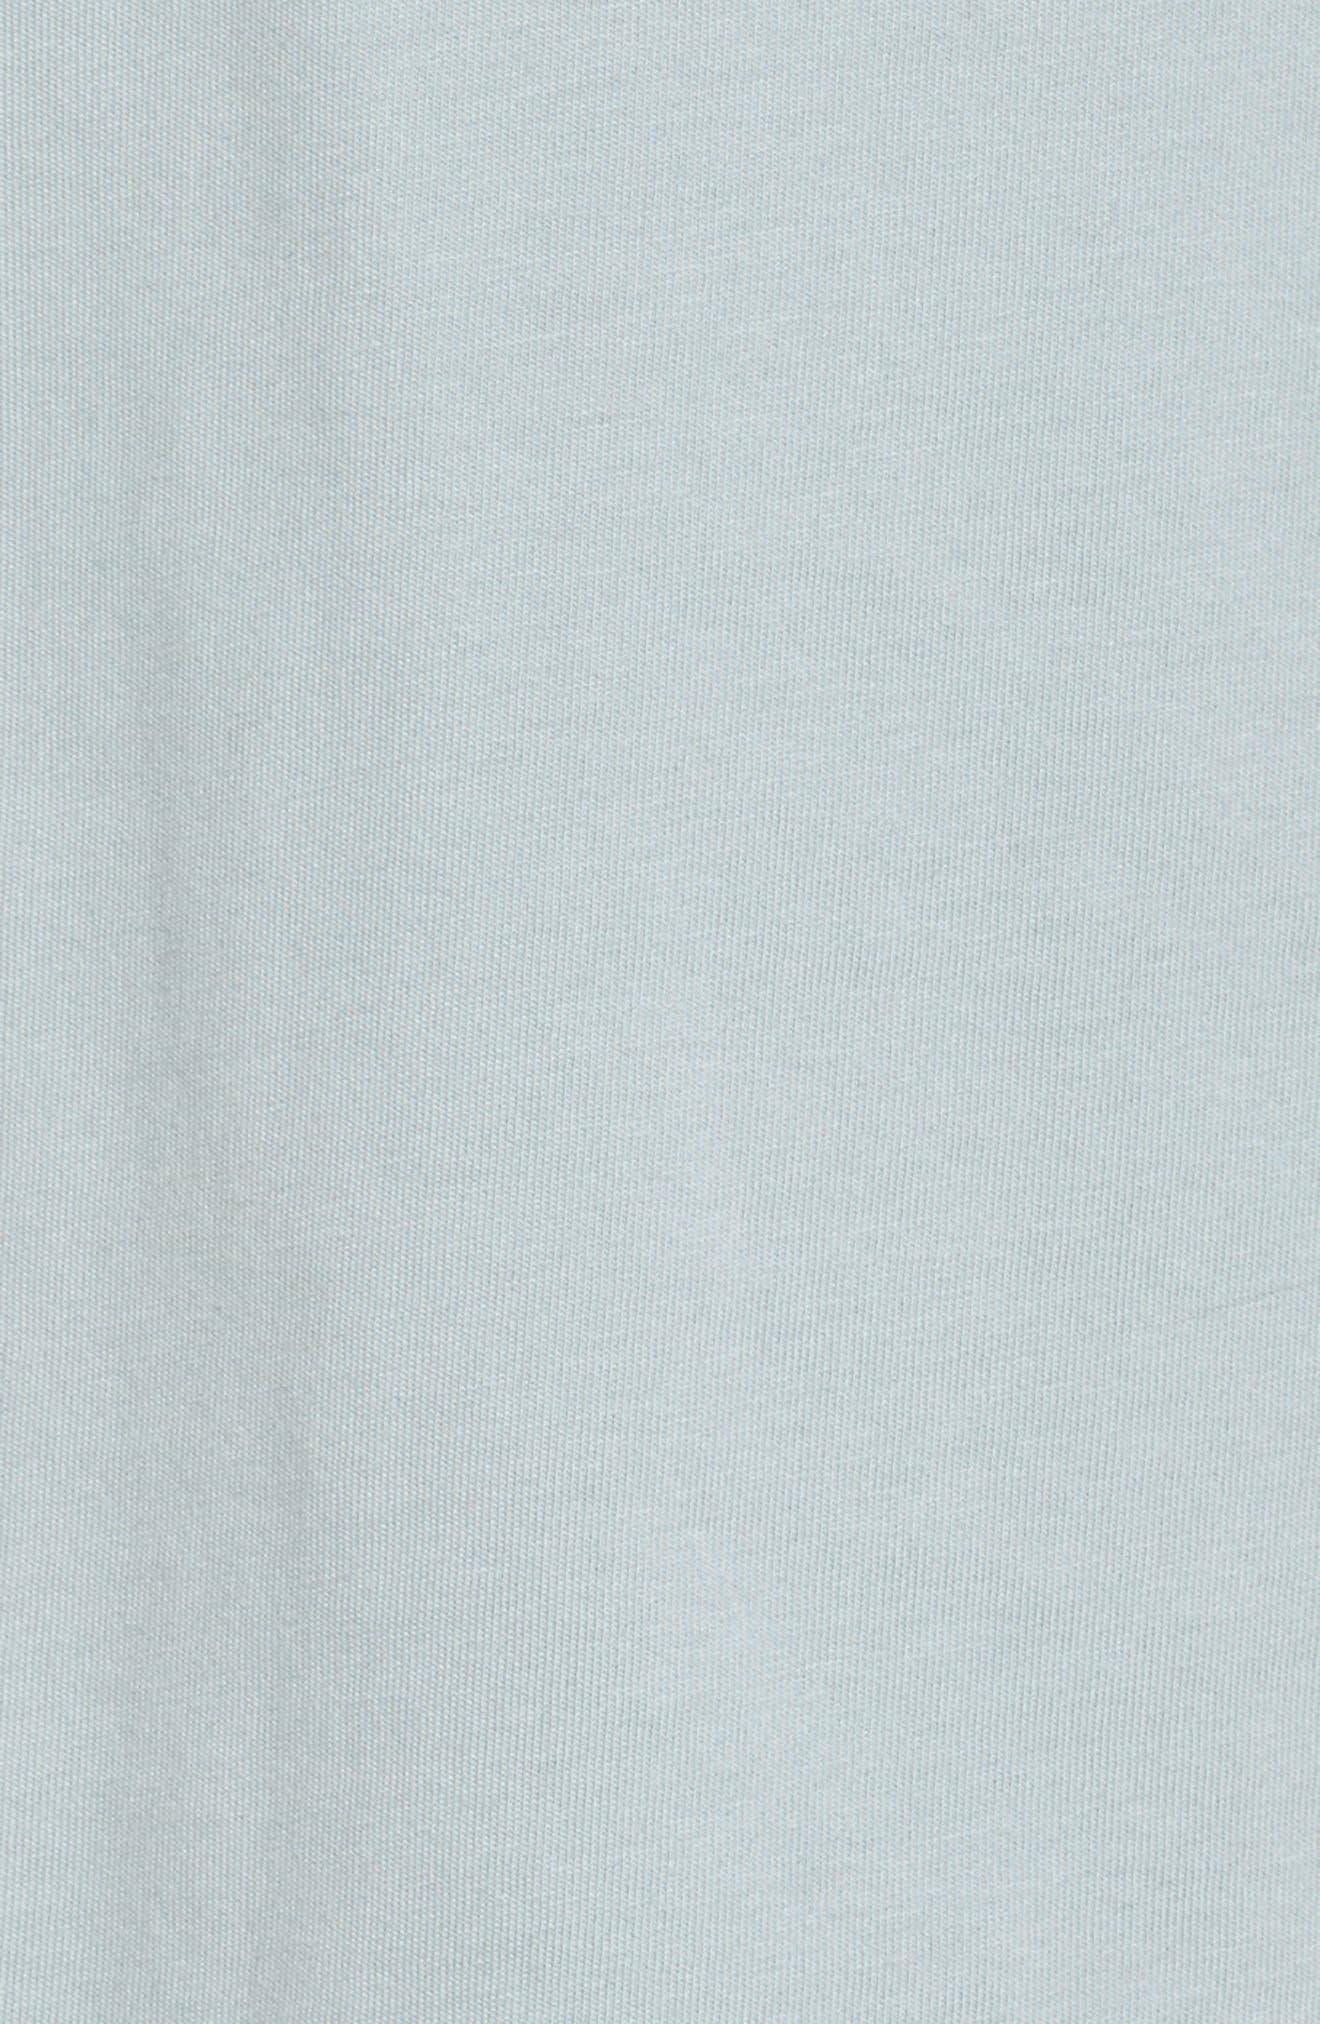 Sportswear Stripe Sleeve Tee,                             Alternate thumbnail 6, color,                             020